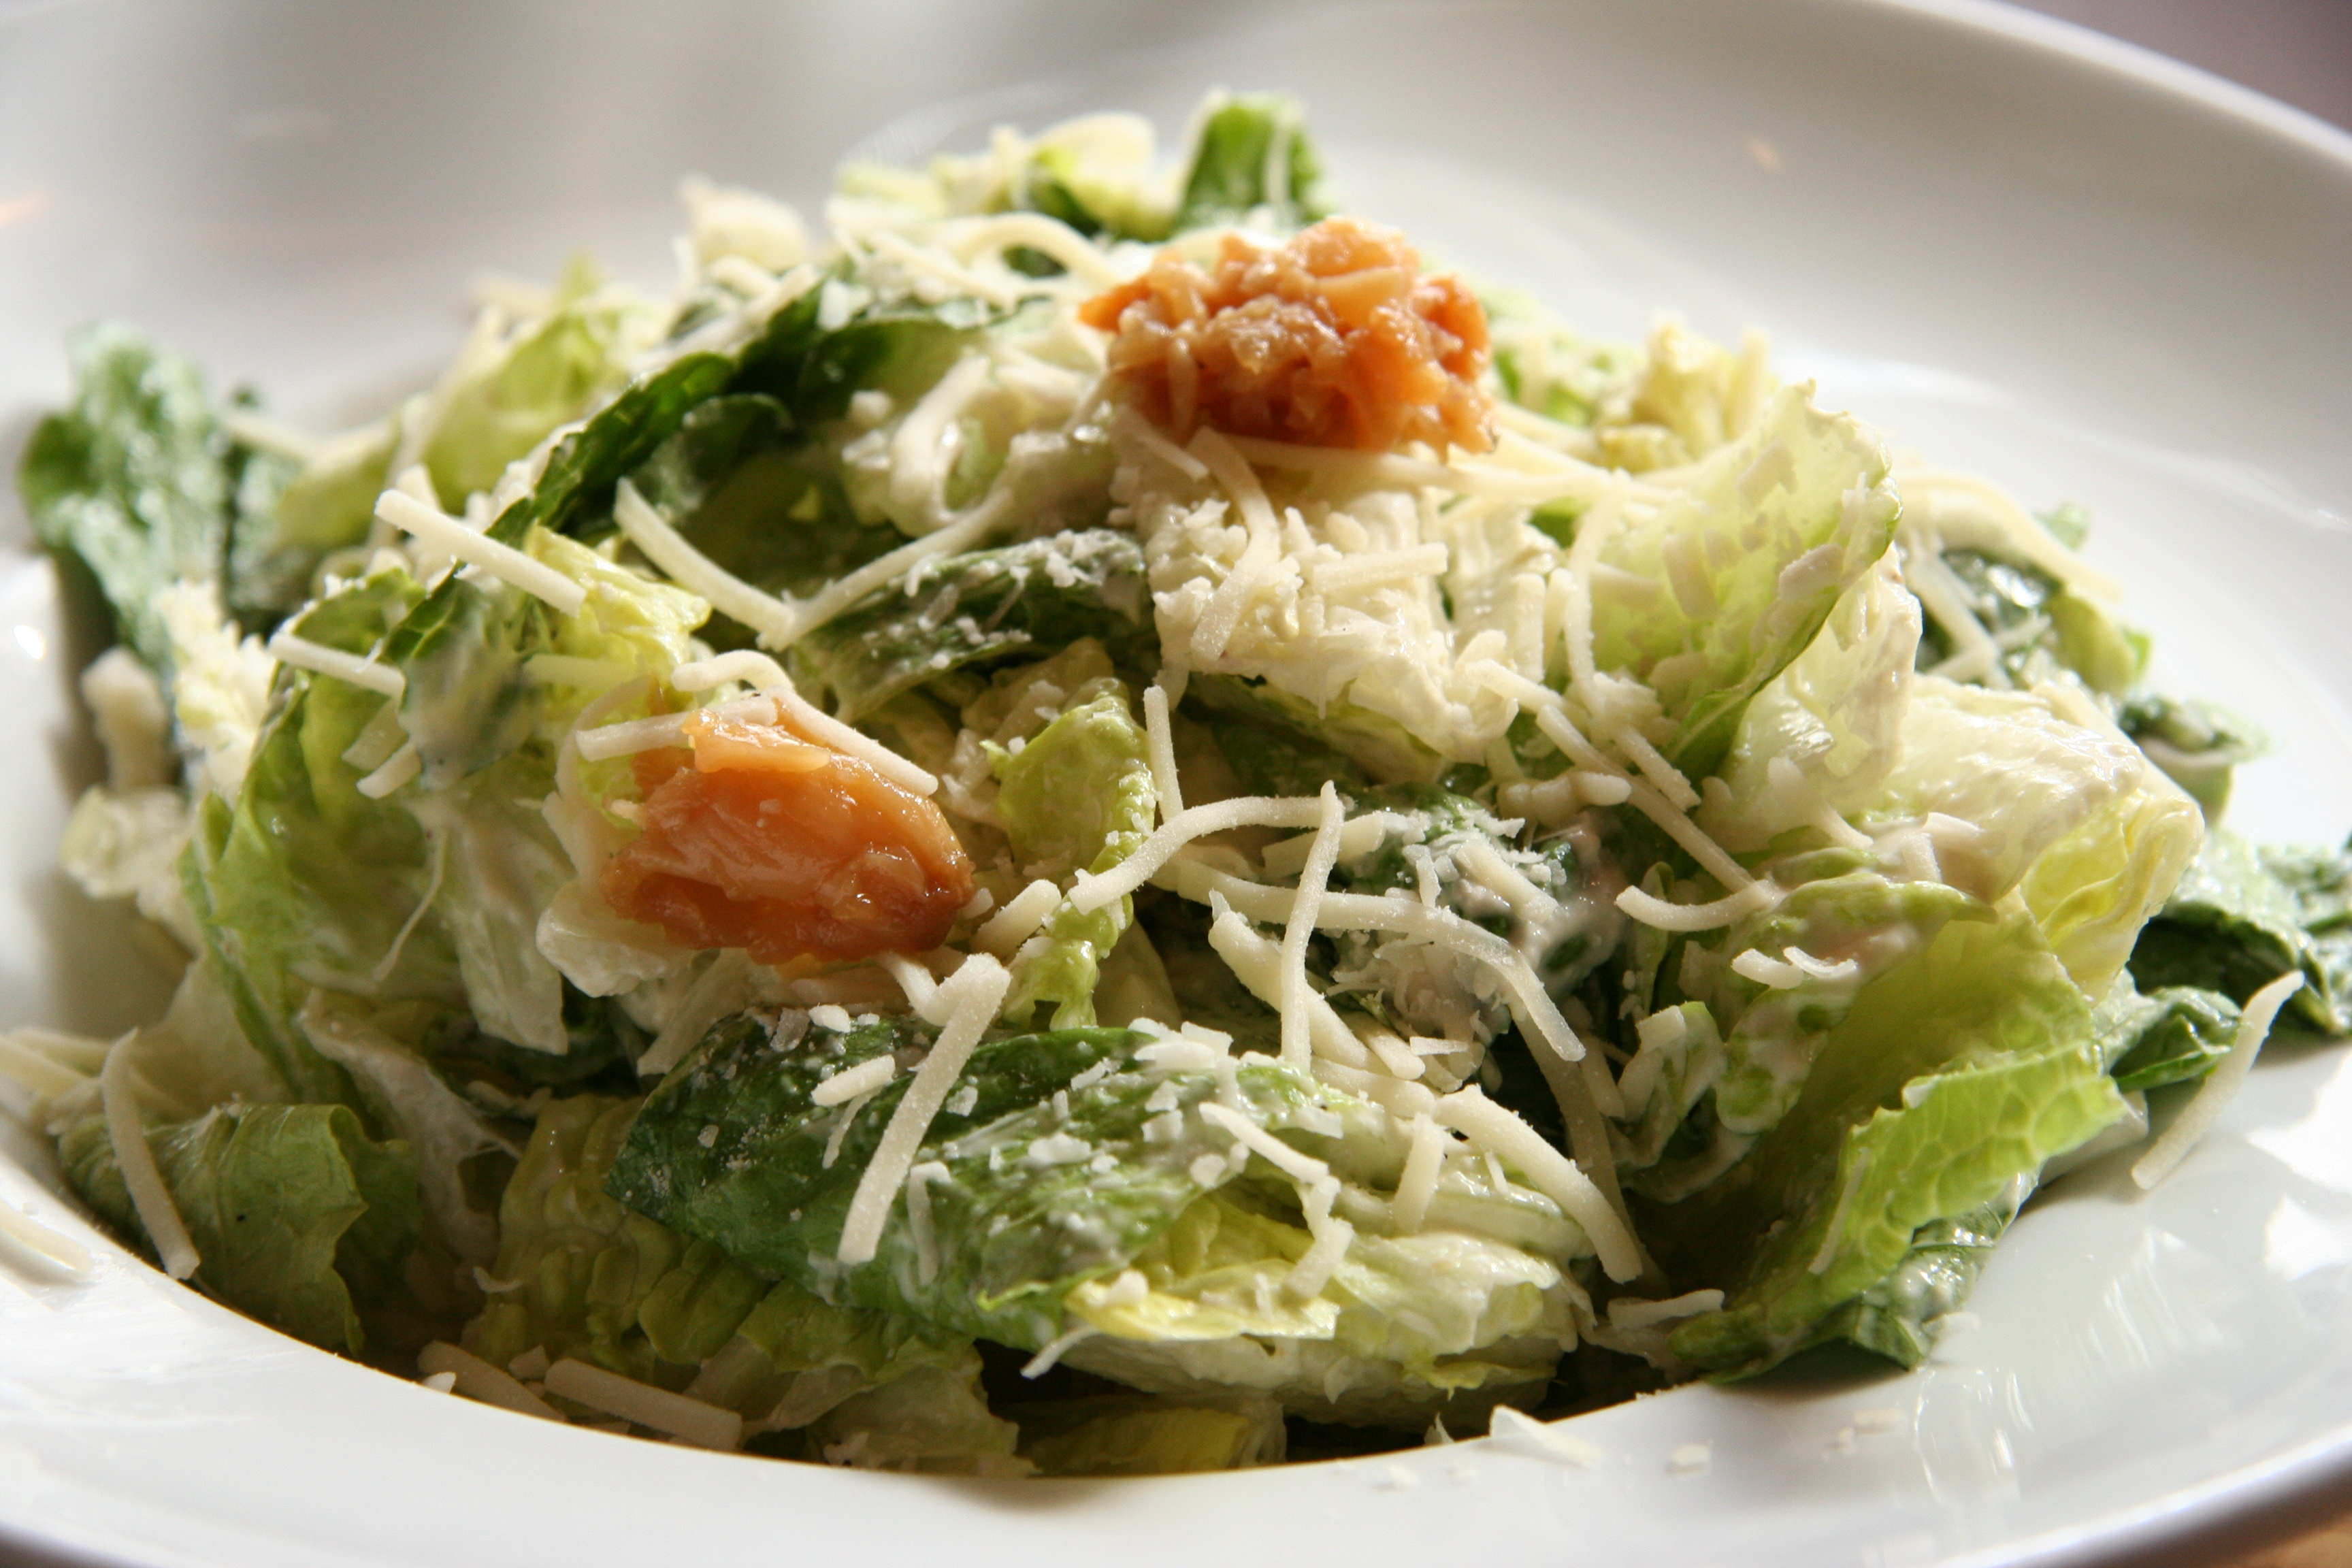 File:Caesar salad (2).jpg - Wikimedia Commons